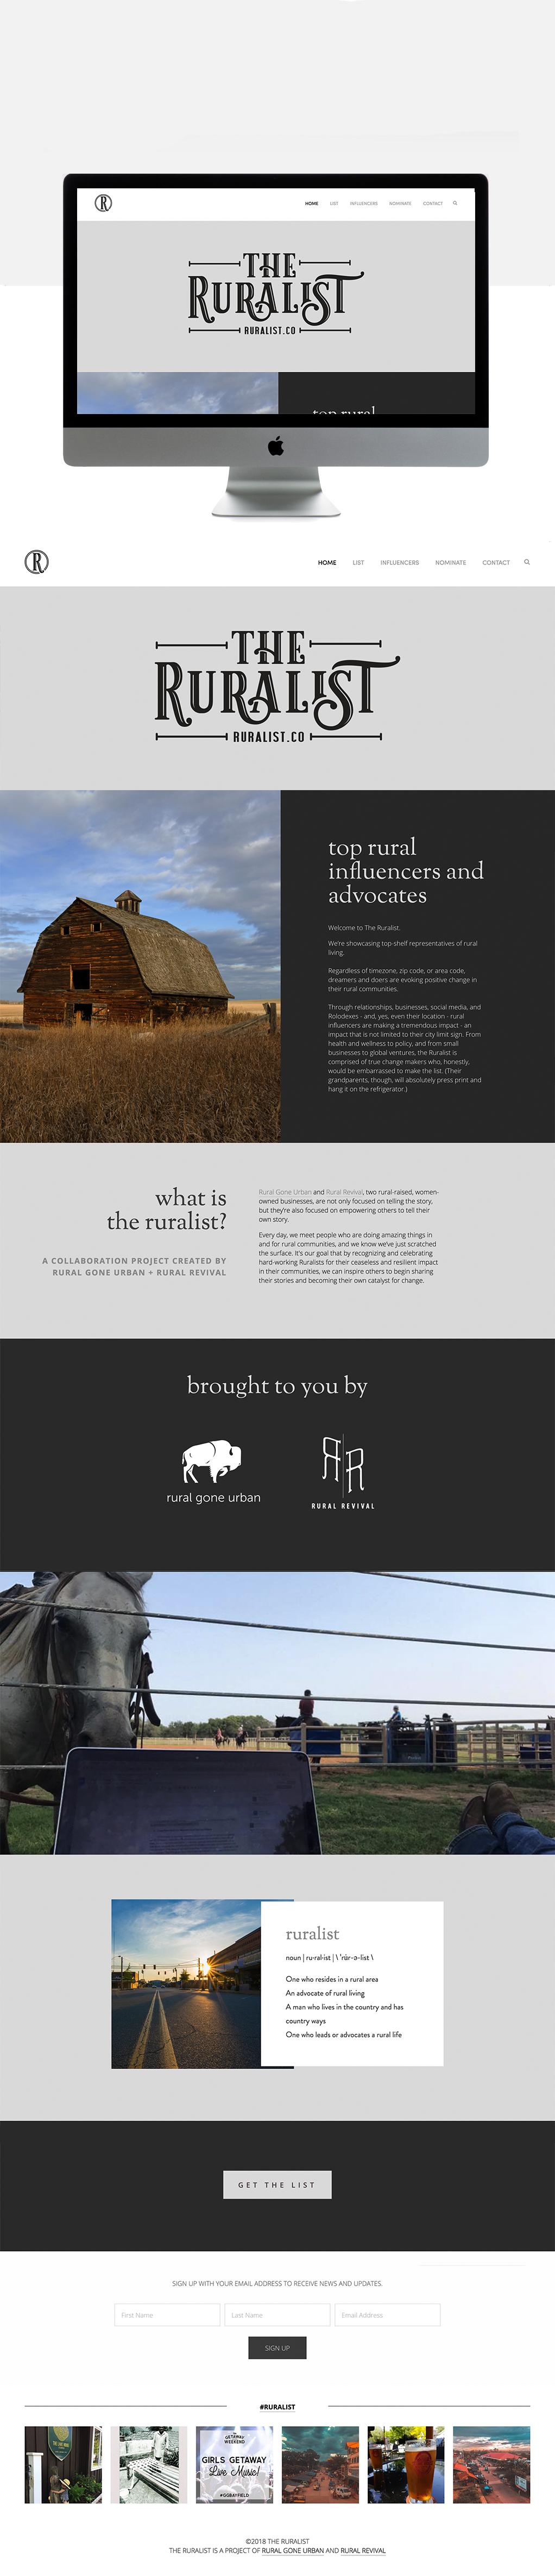 ruralist website board.jpg